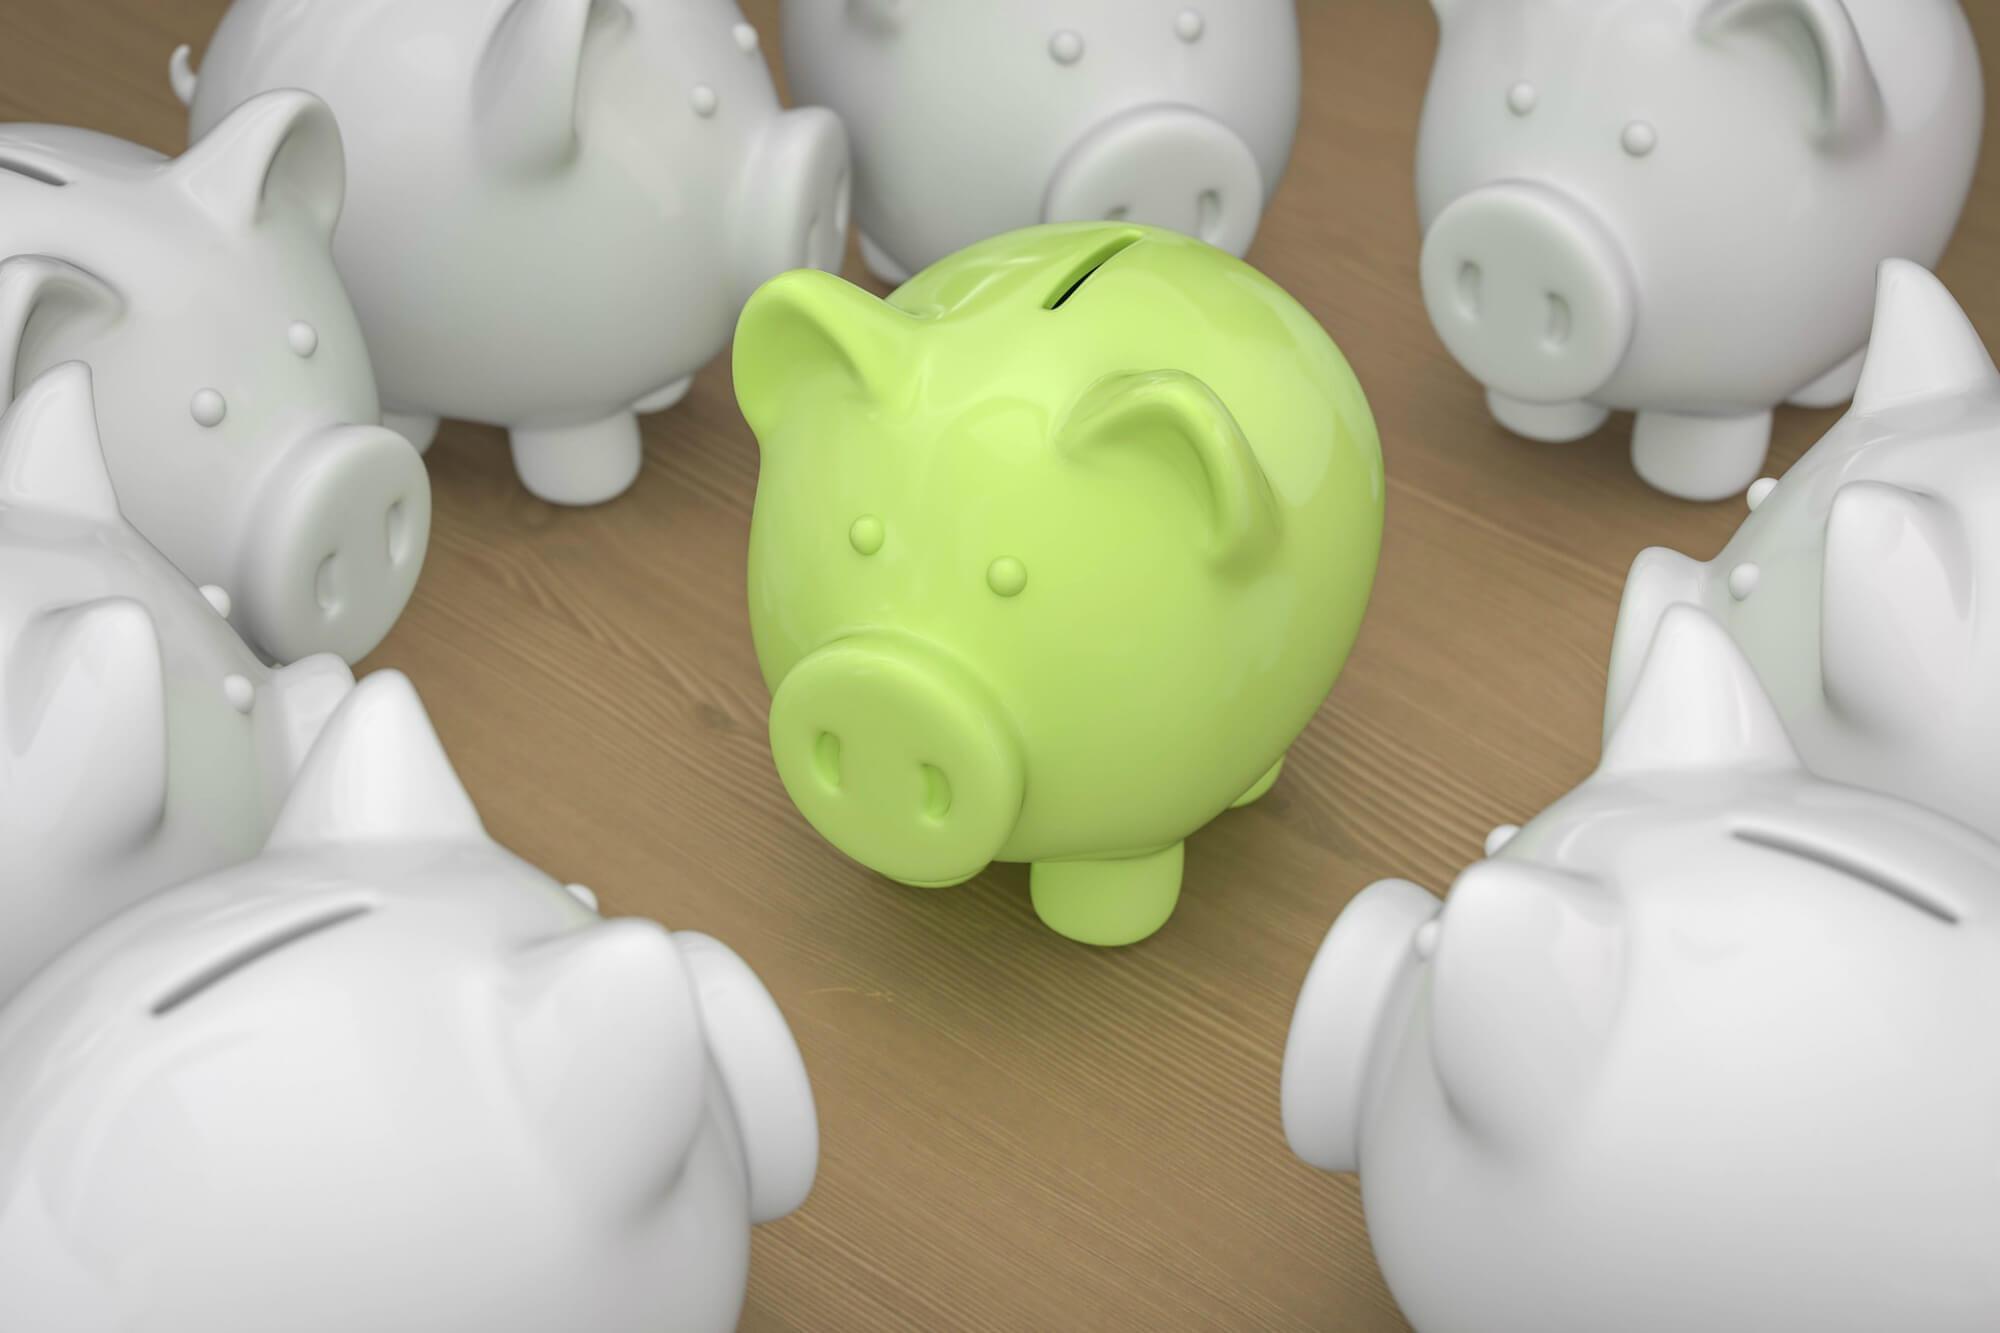 10 franquias baratas que custam menos de R$ 25 mil